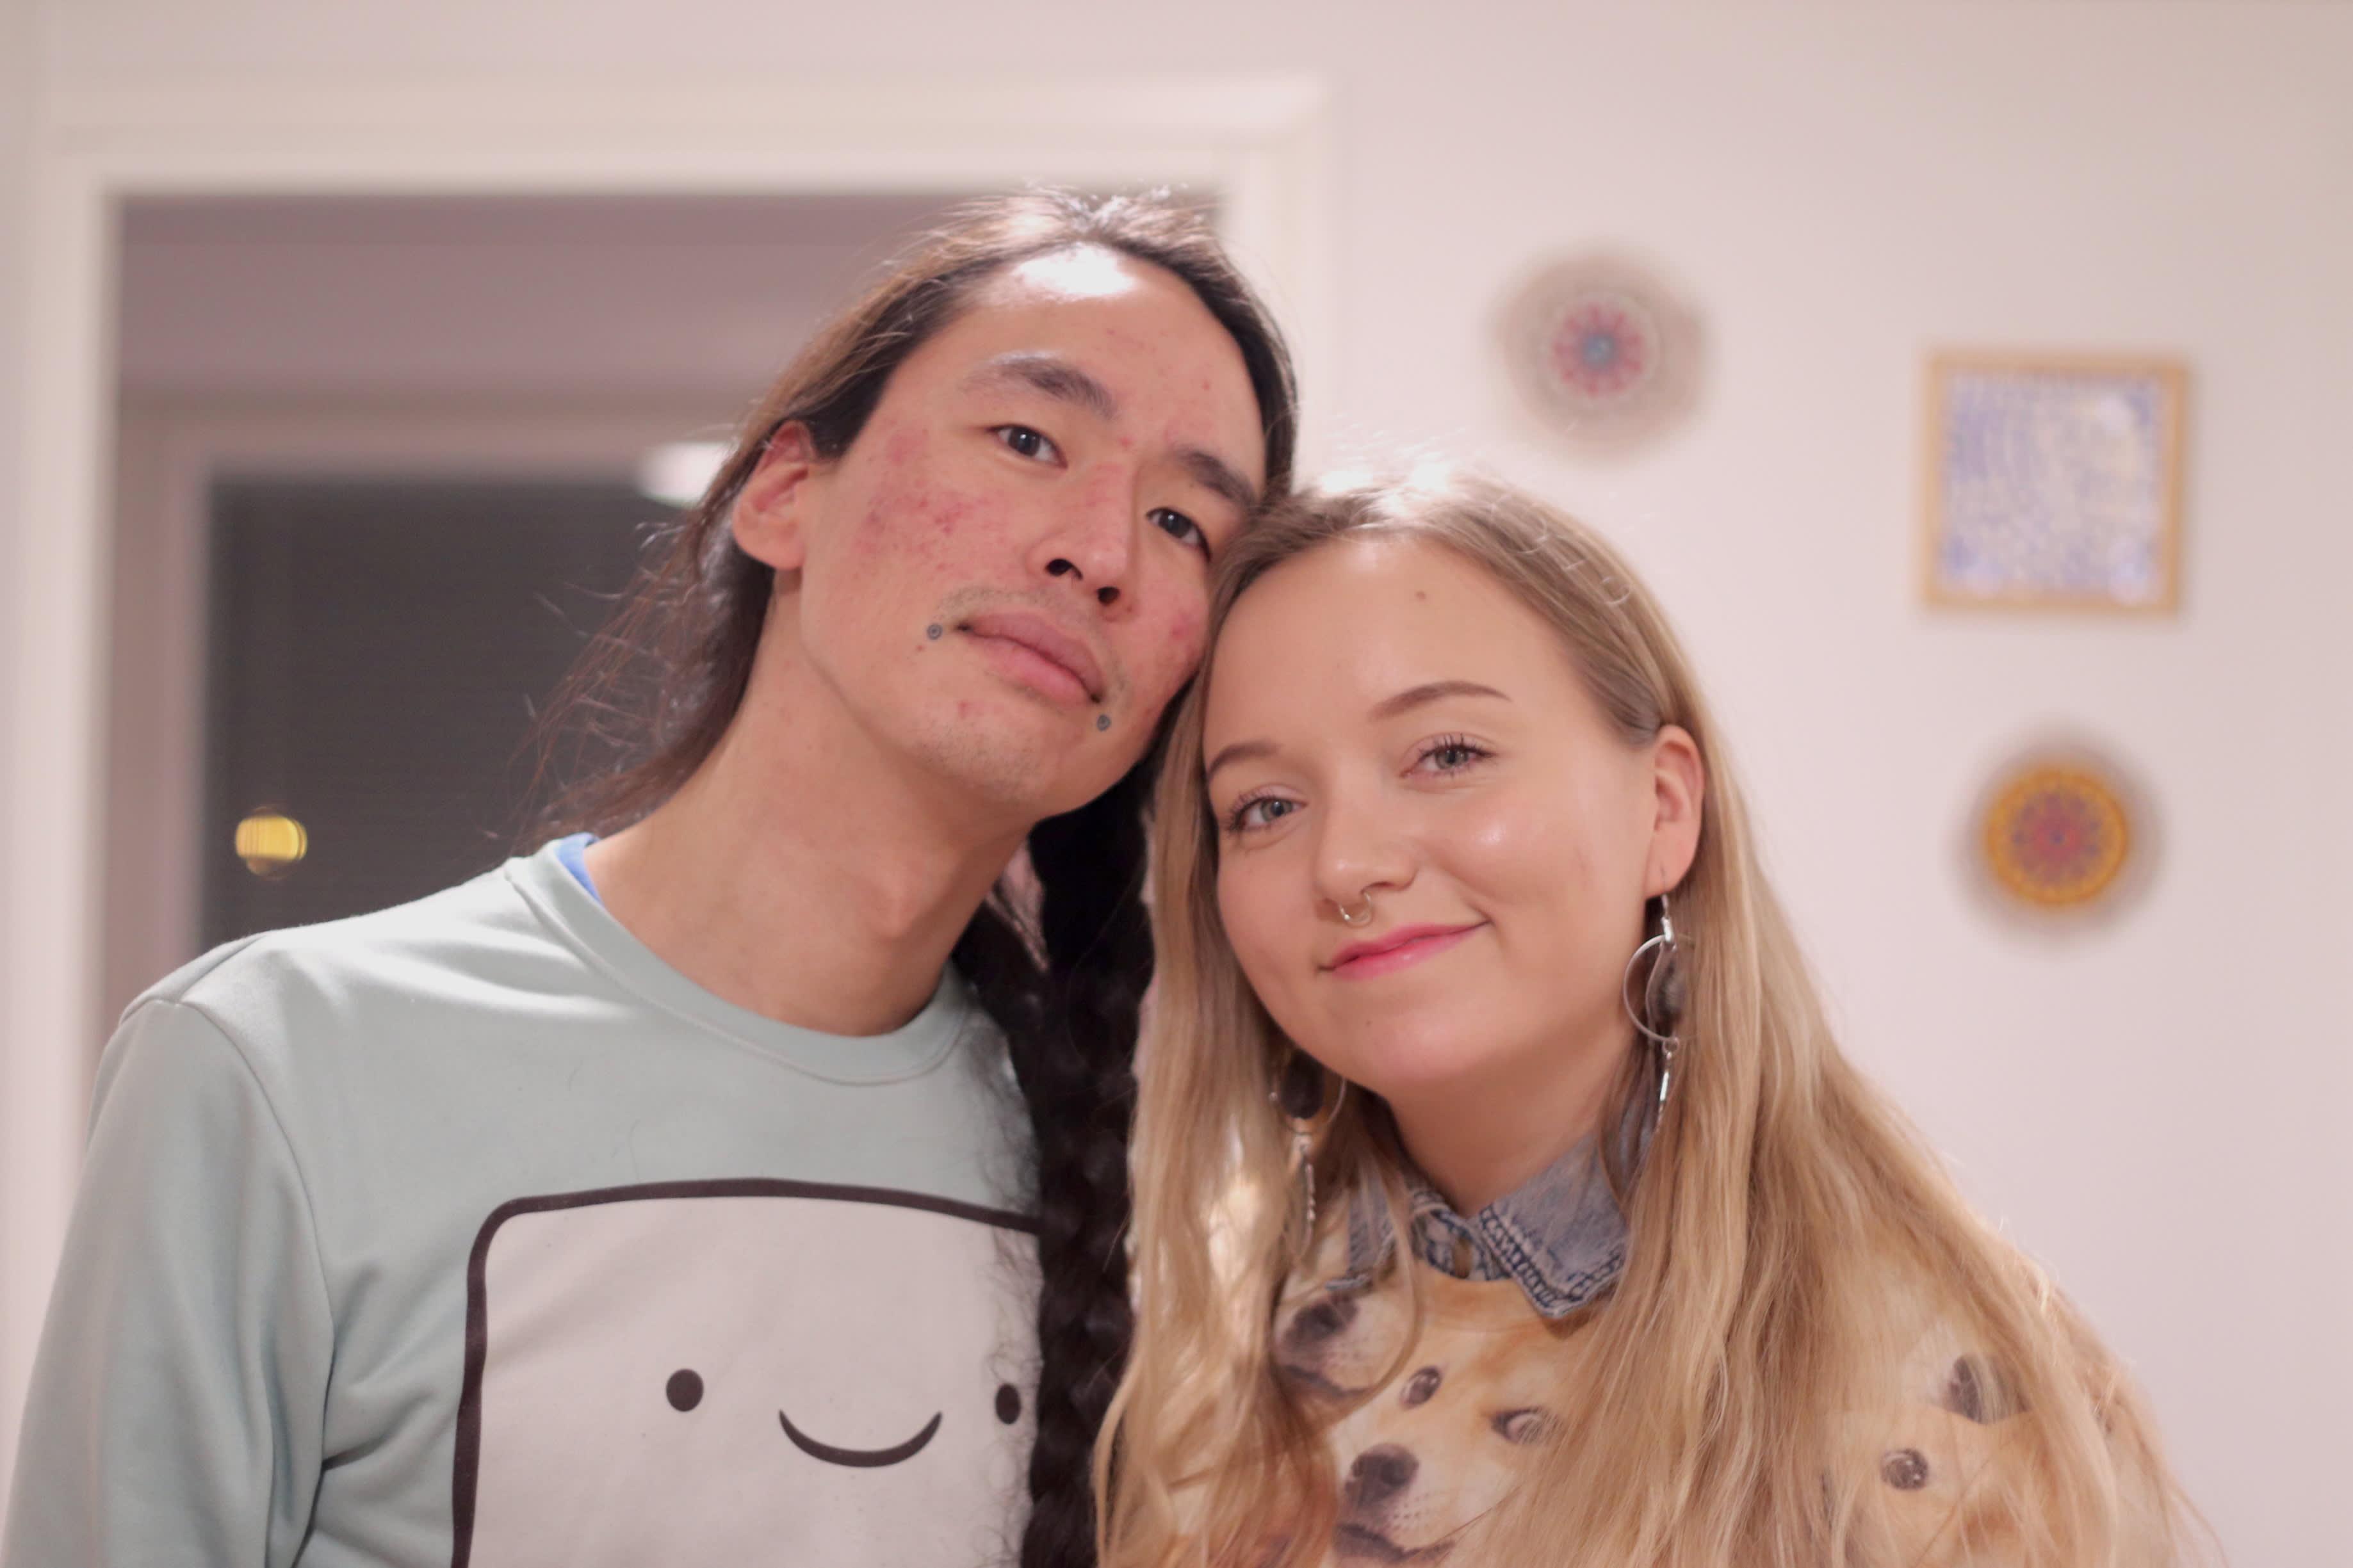 gearddit, Aqqalu Berthelsen, Sunna Nousuniemi